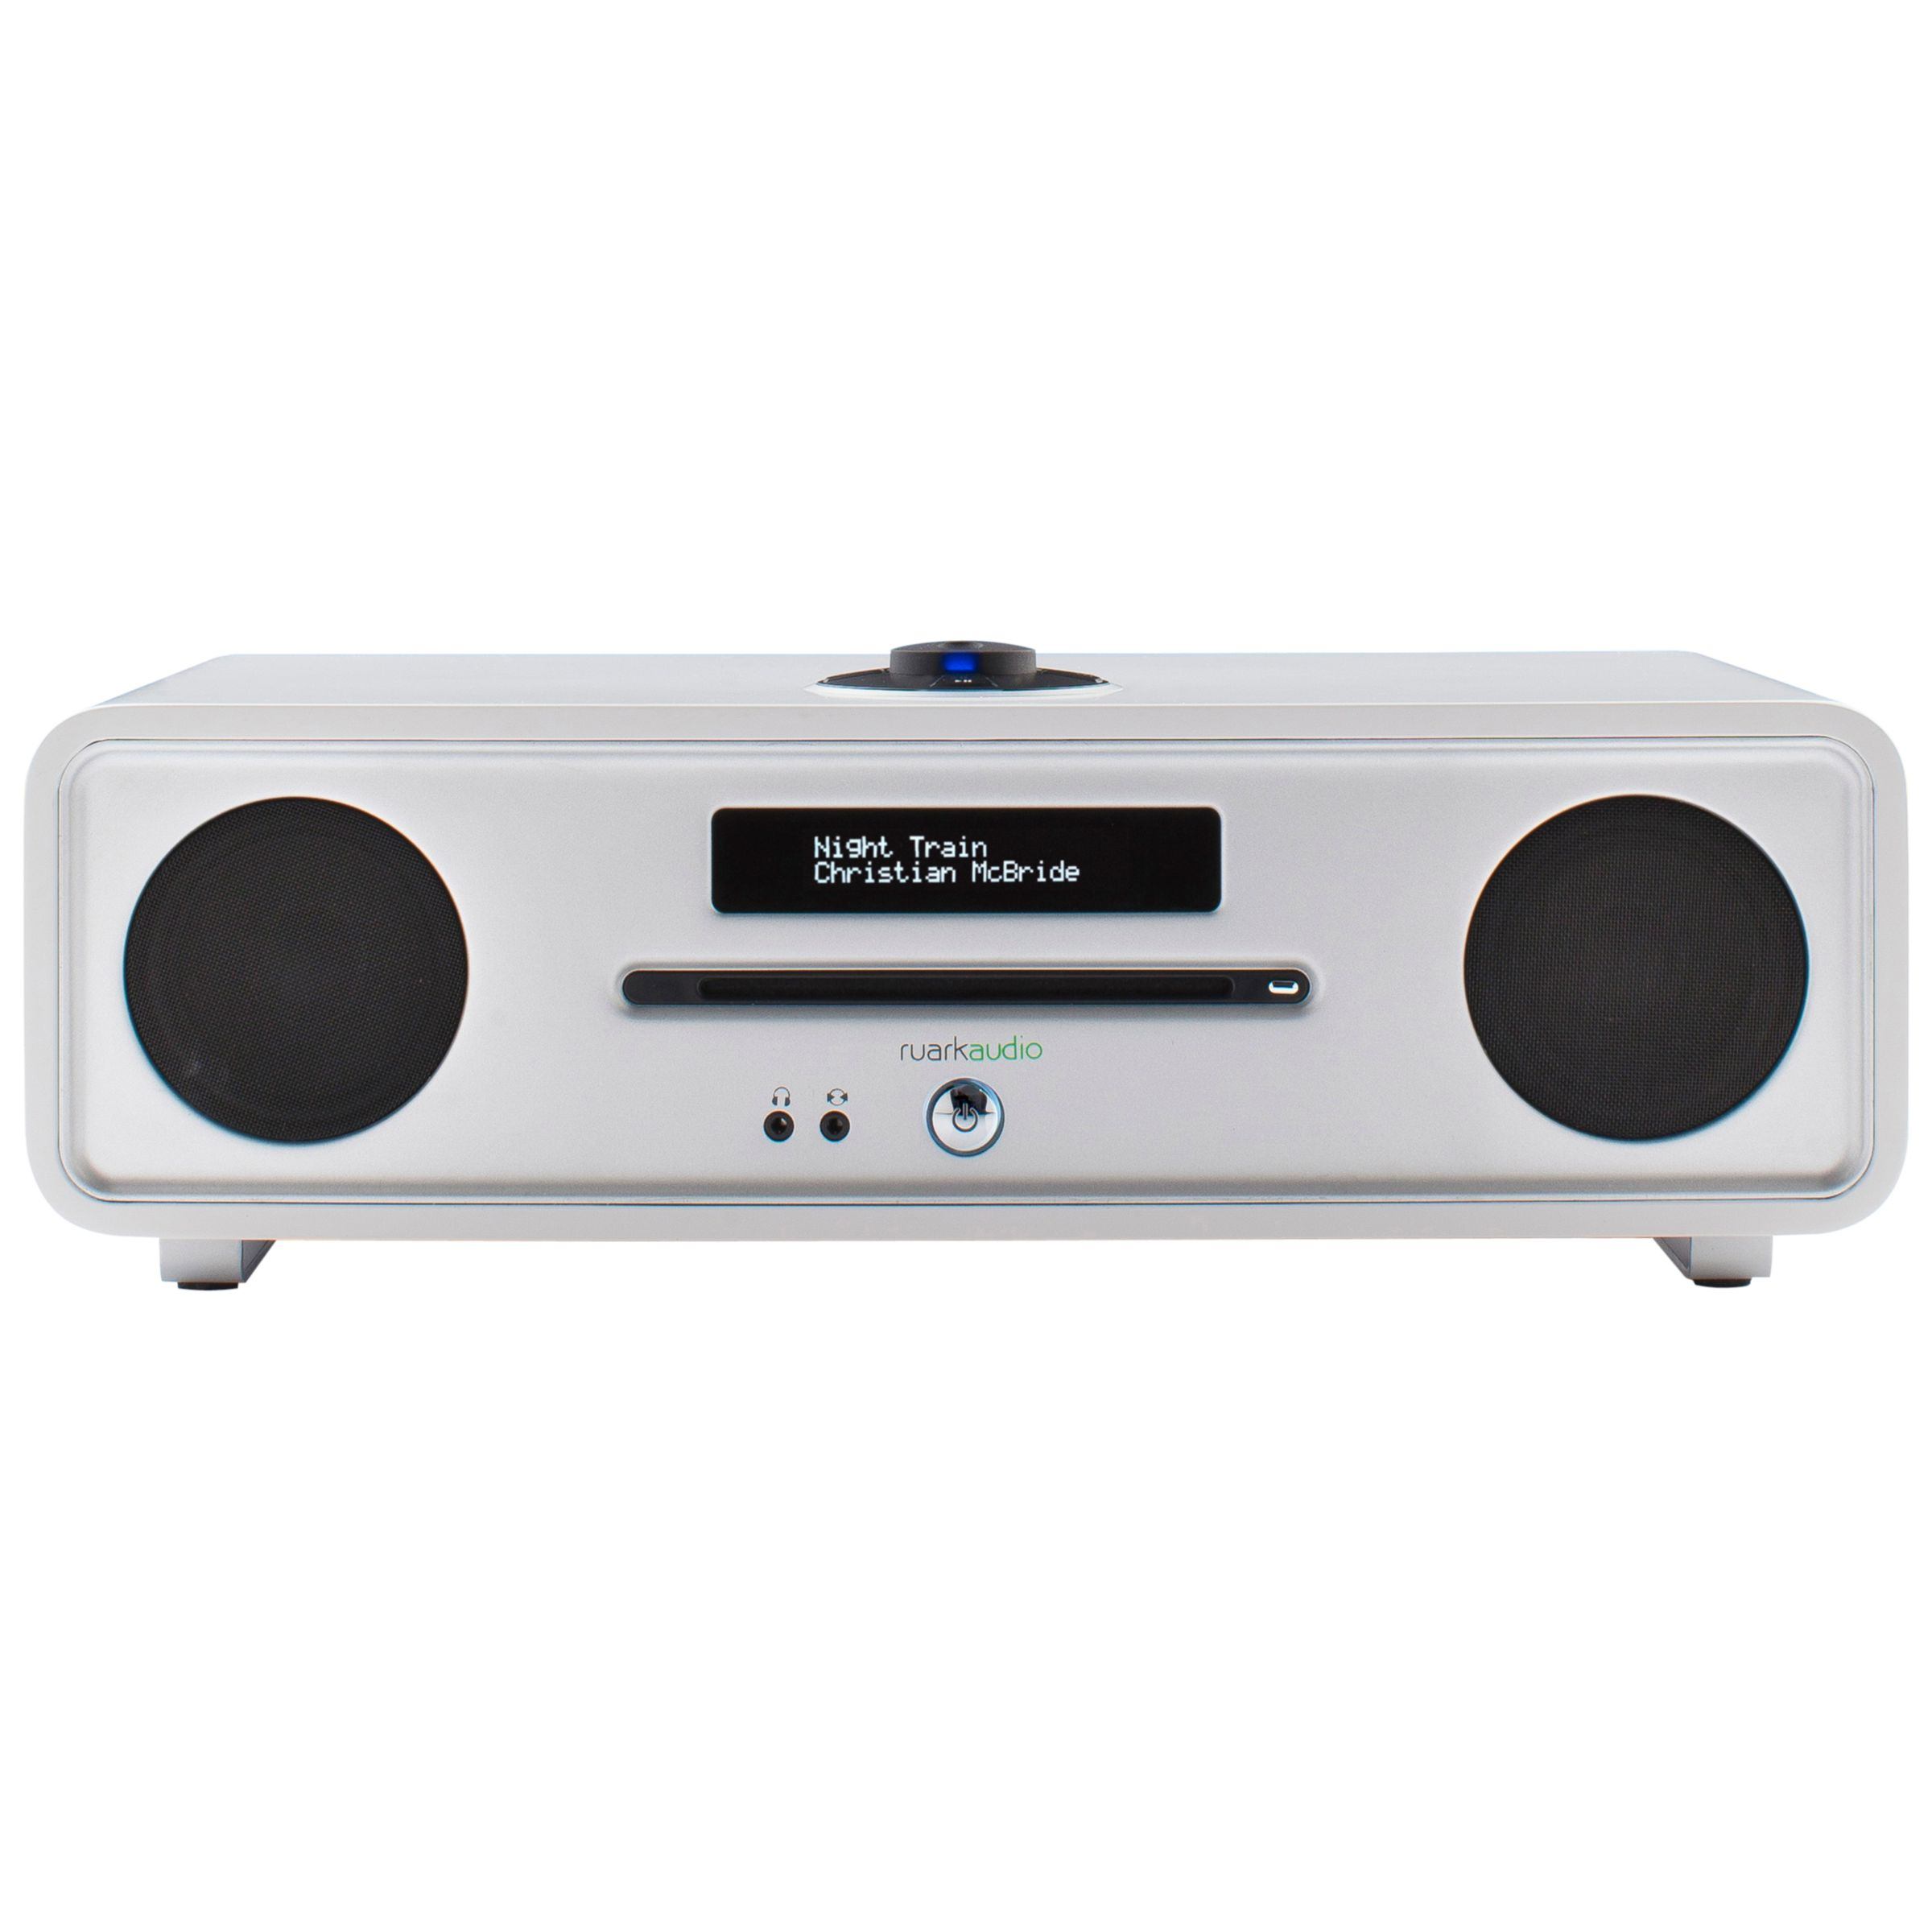 Ruark Audio Ruark R4 MK3 DAB/DAB+/FM Radio & CD Bluetooth All-In-One Music System with OLED Display